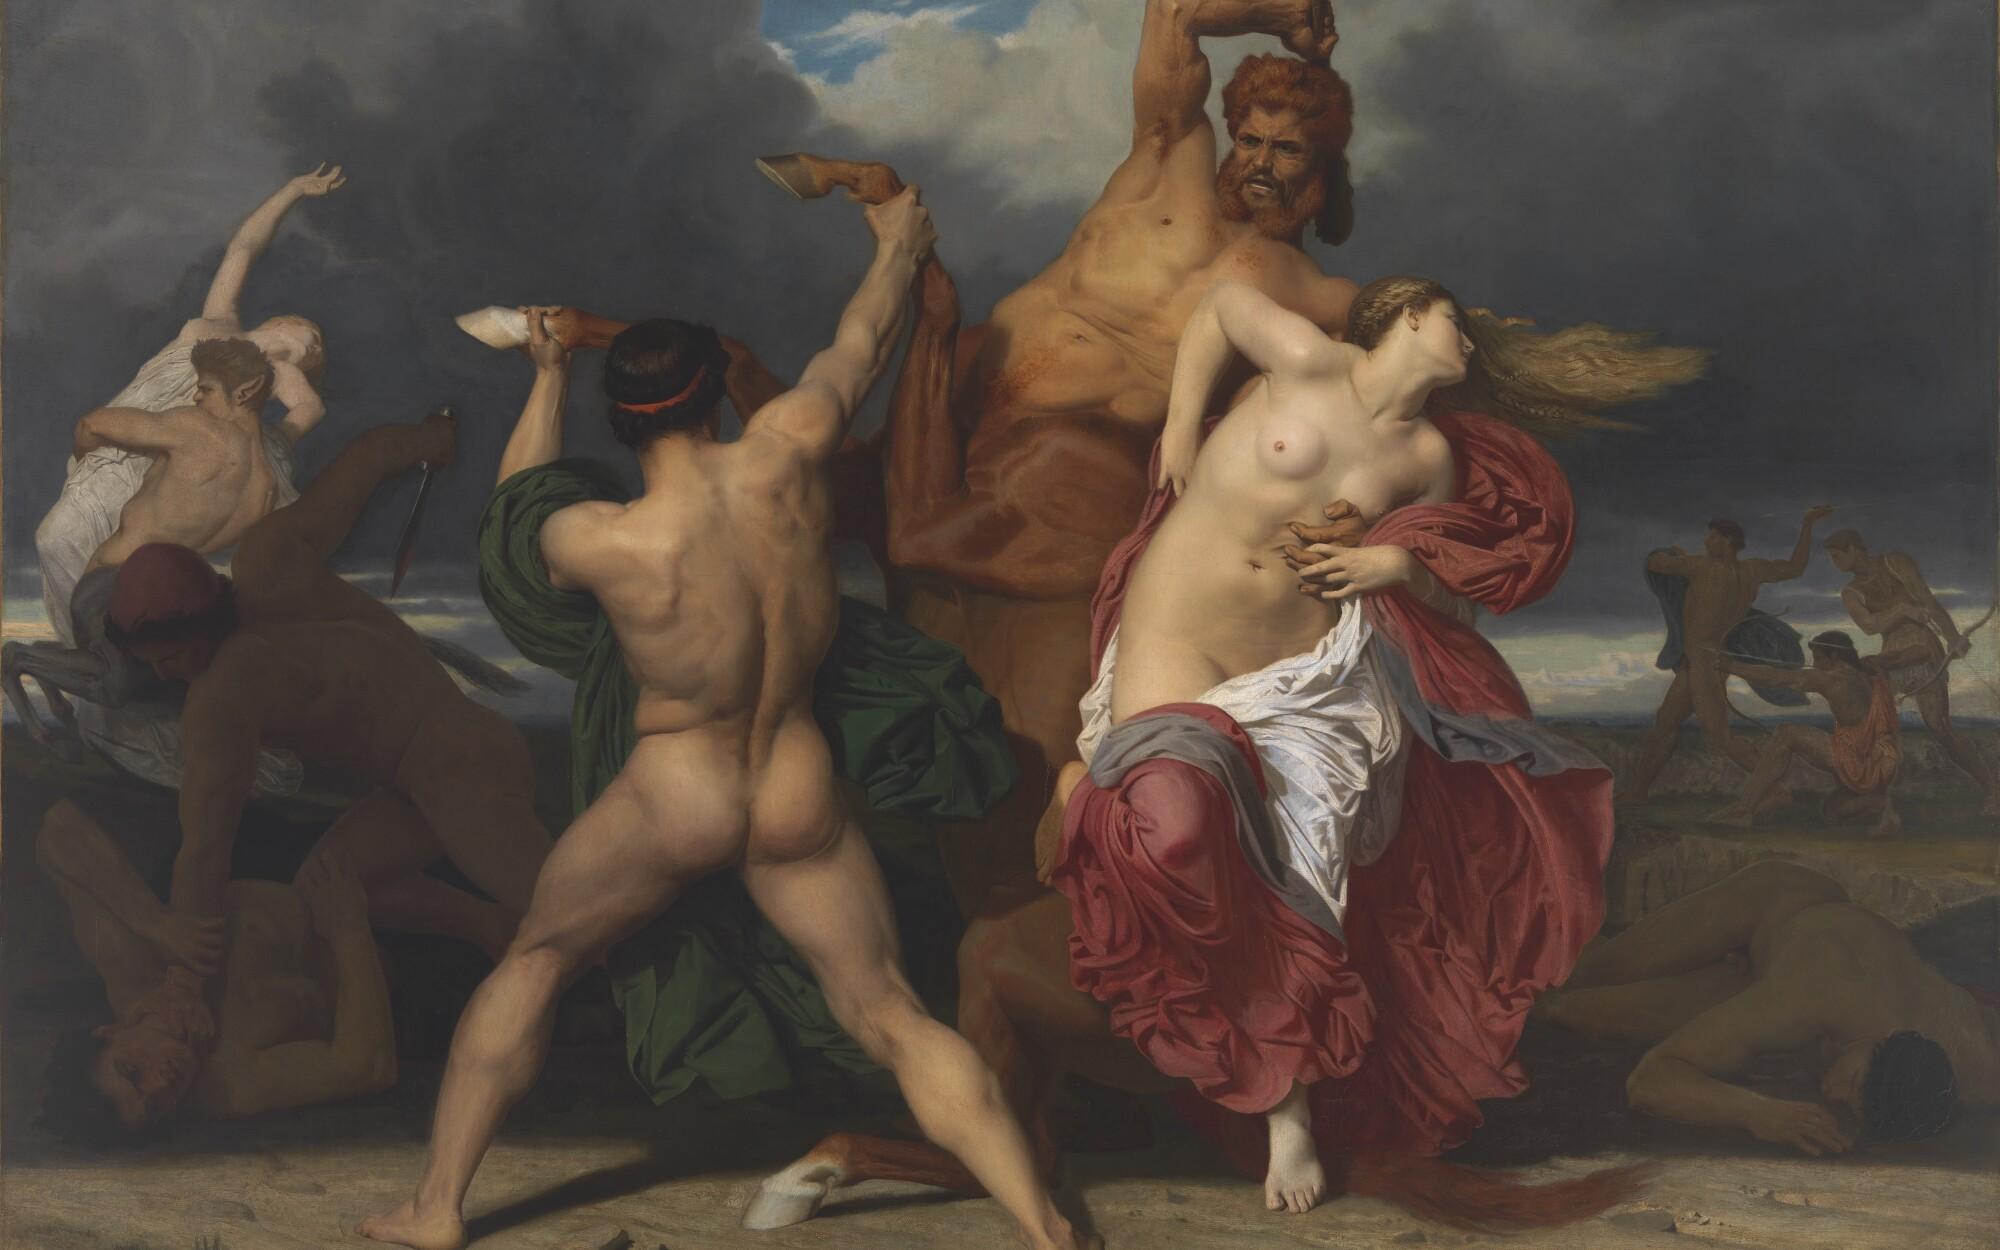 "William-Adolphe Bouguereau: ""Battle of the Centaurs and the Lapithae"" (Bataille des Centaures contre les Lapithes), 1852"